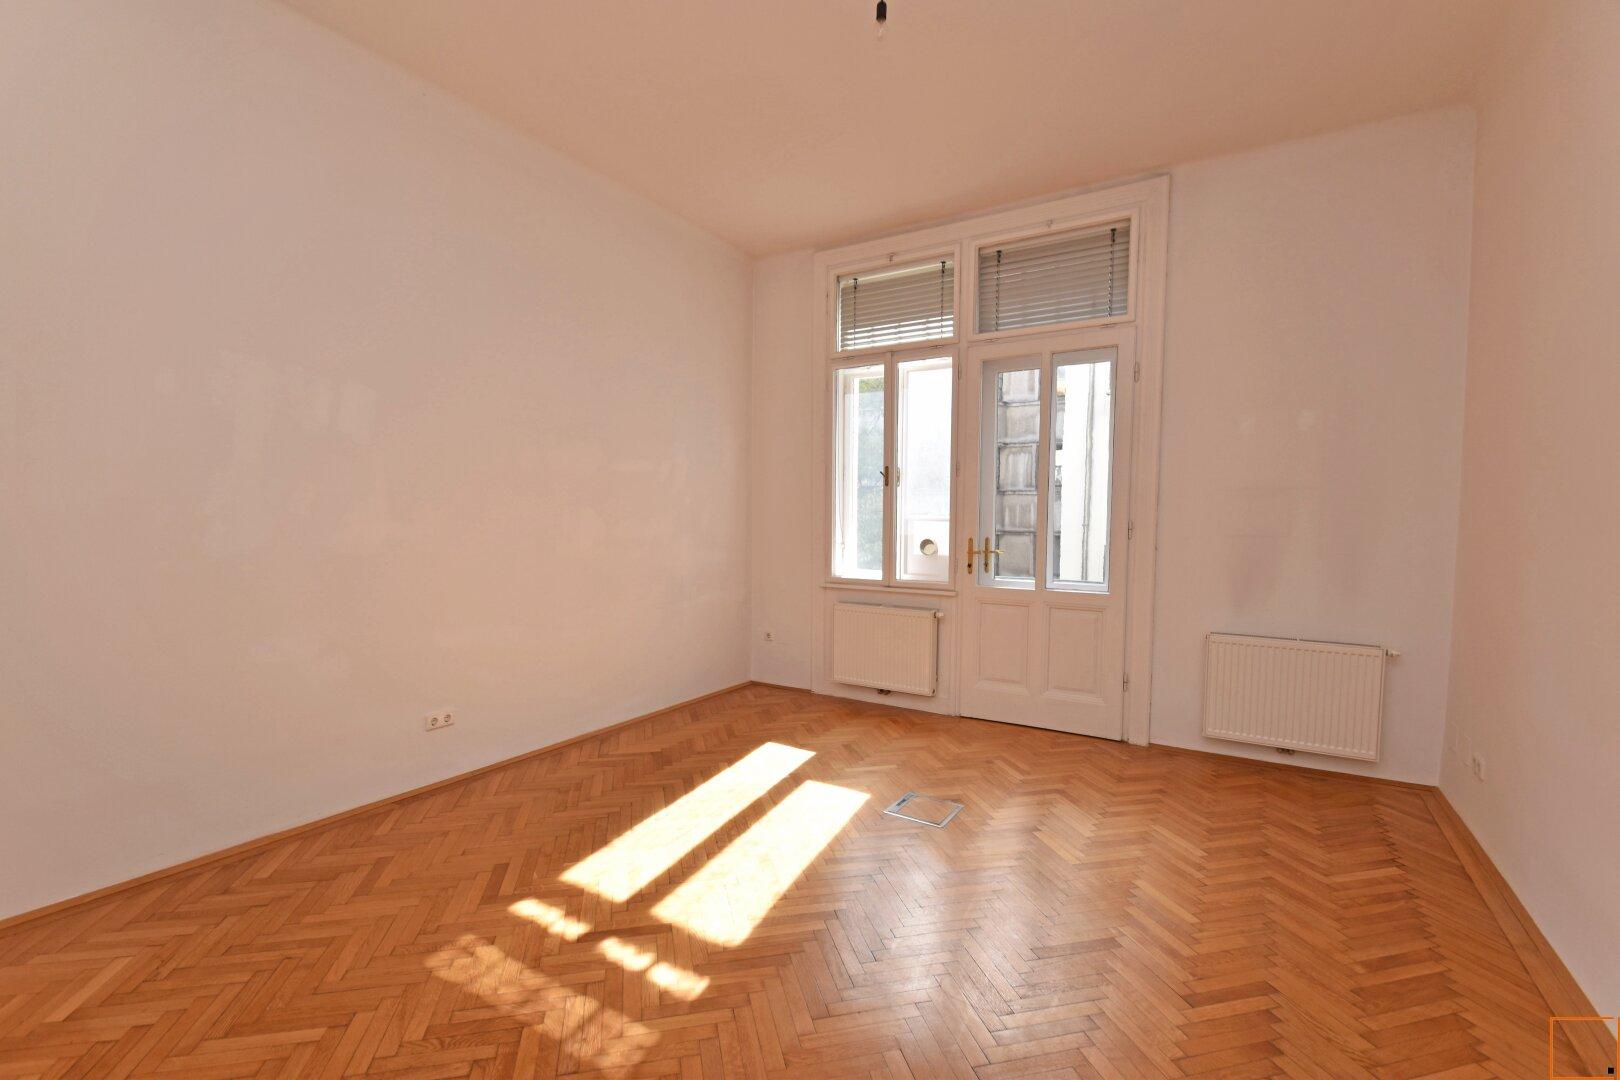 Zimmer 21,66 m²